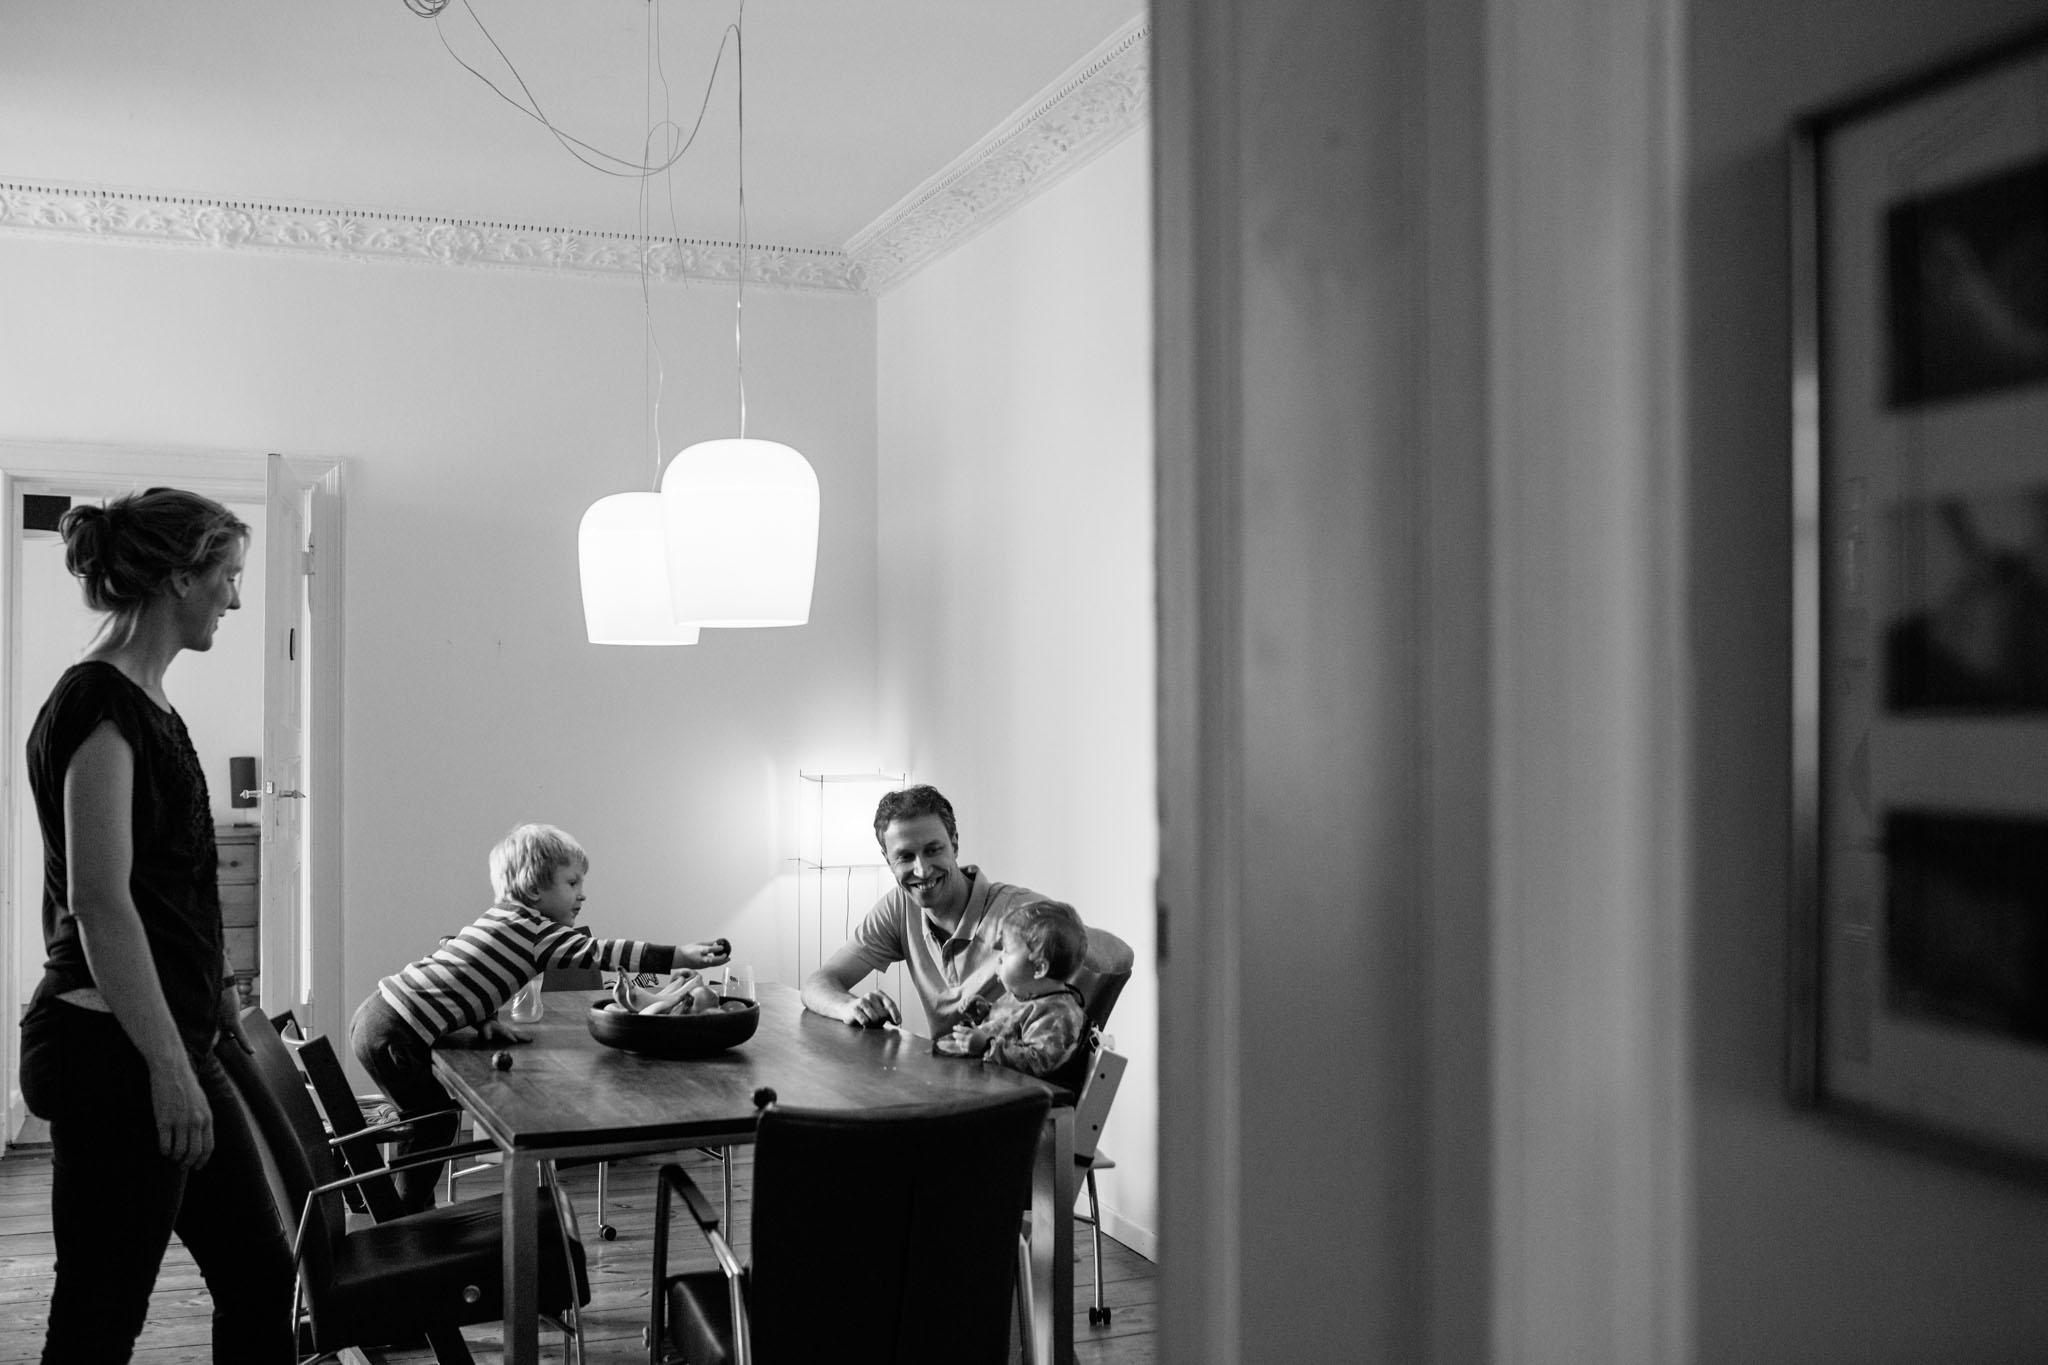 familie-fotos-essen-schwarzweiss-reportage-berlin-kreuzberg